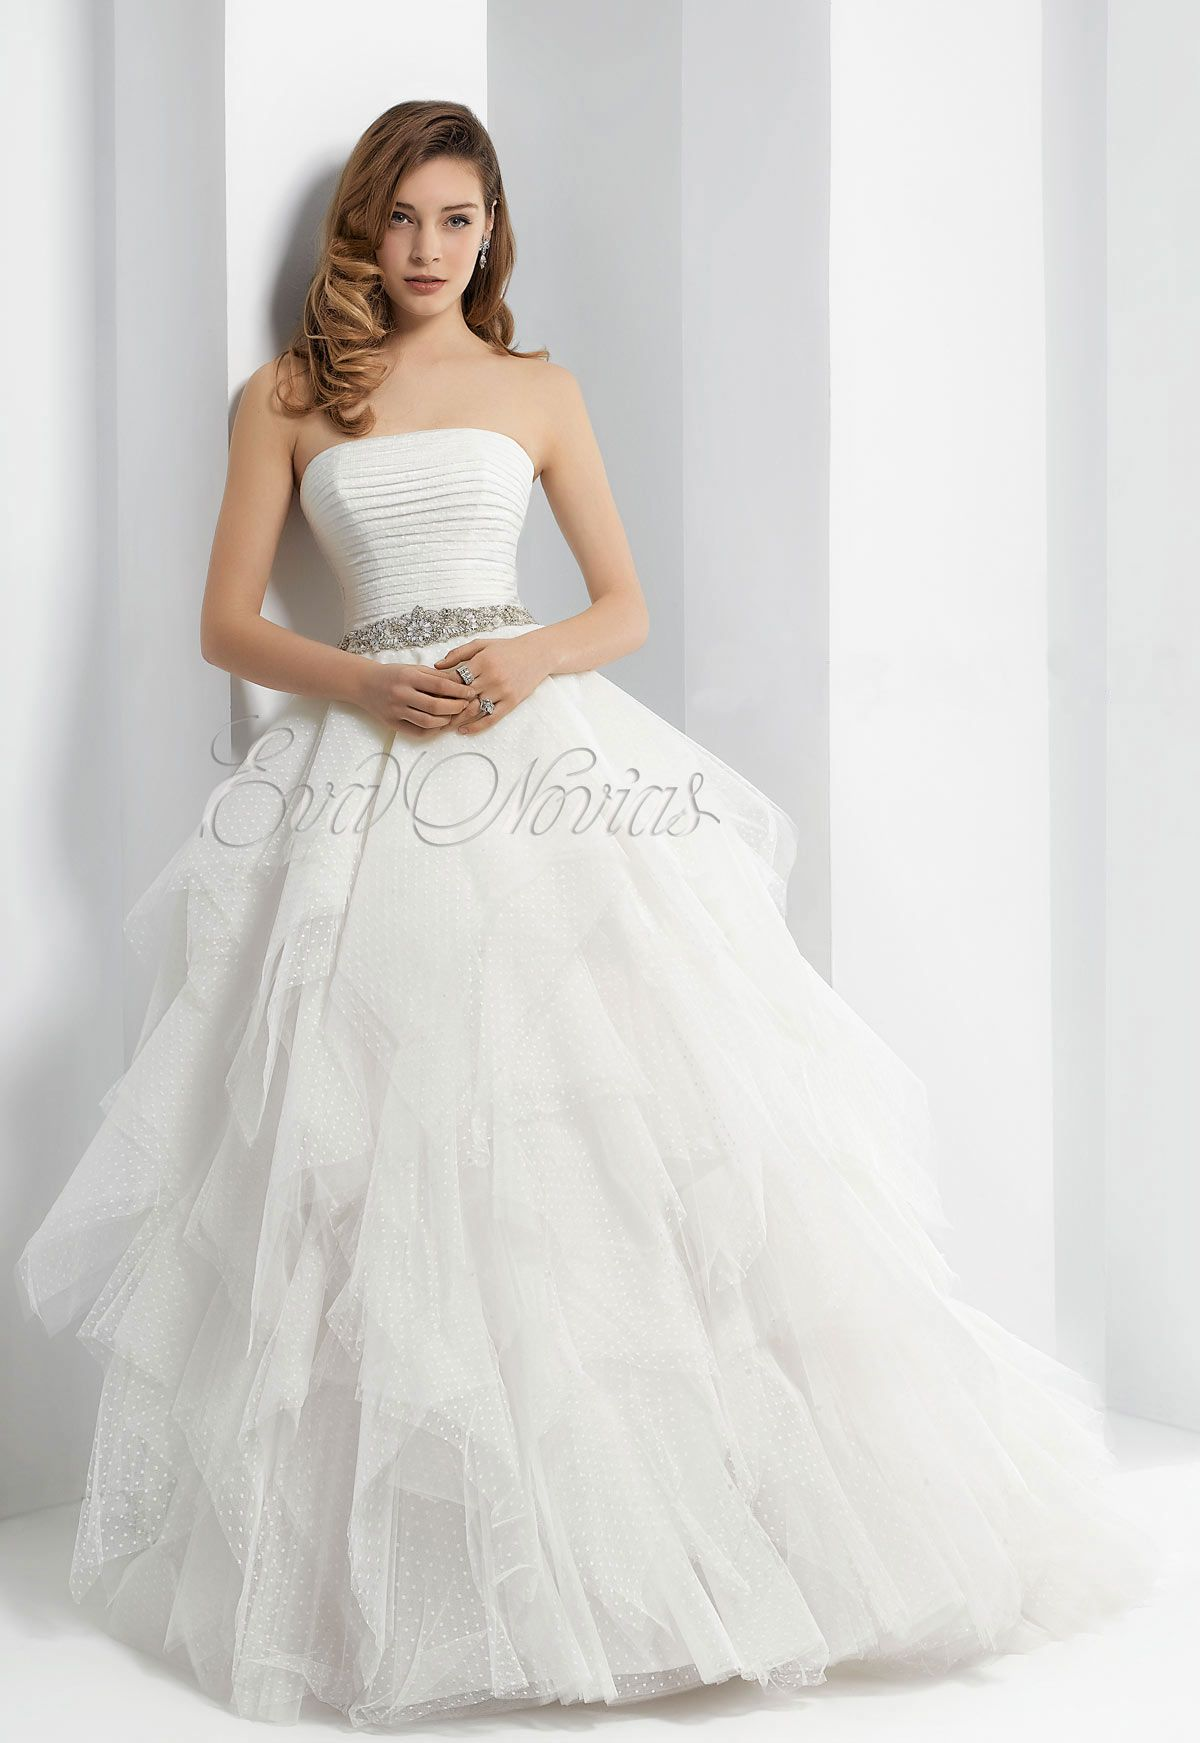 Vestido de novia Pepe Botella colección 2016 modelo 581 en Eva Novias Madrid. #weddingdress #vestido #novia #boda #madrid #tienda #novias #moda #bridalfashion